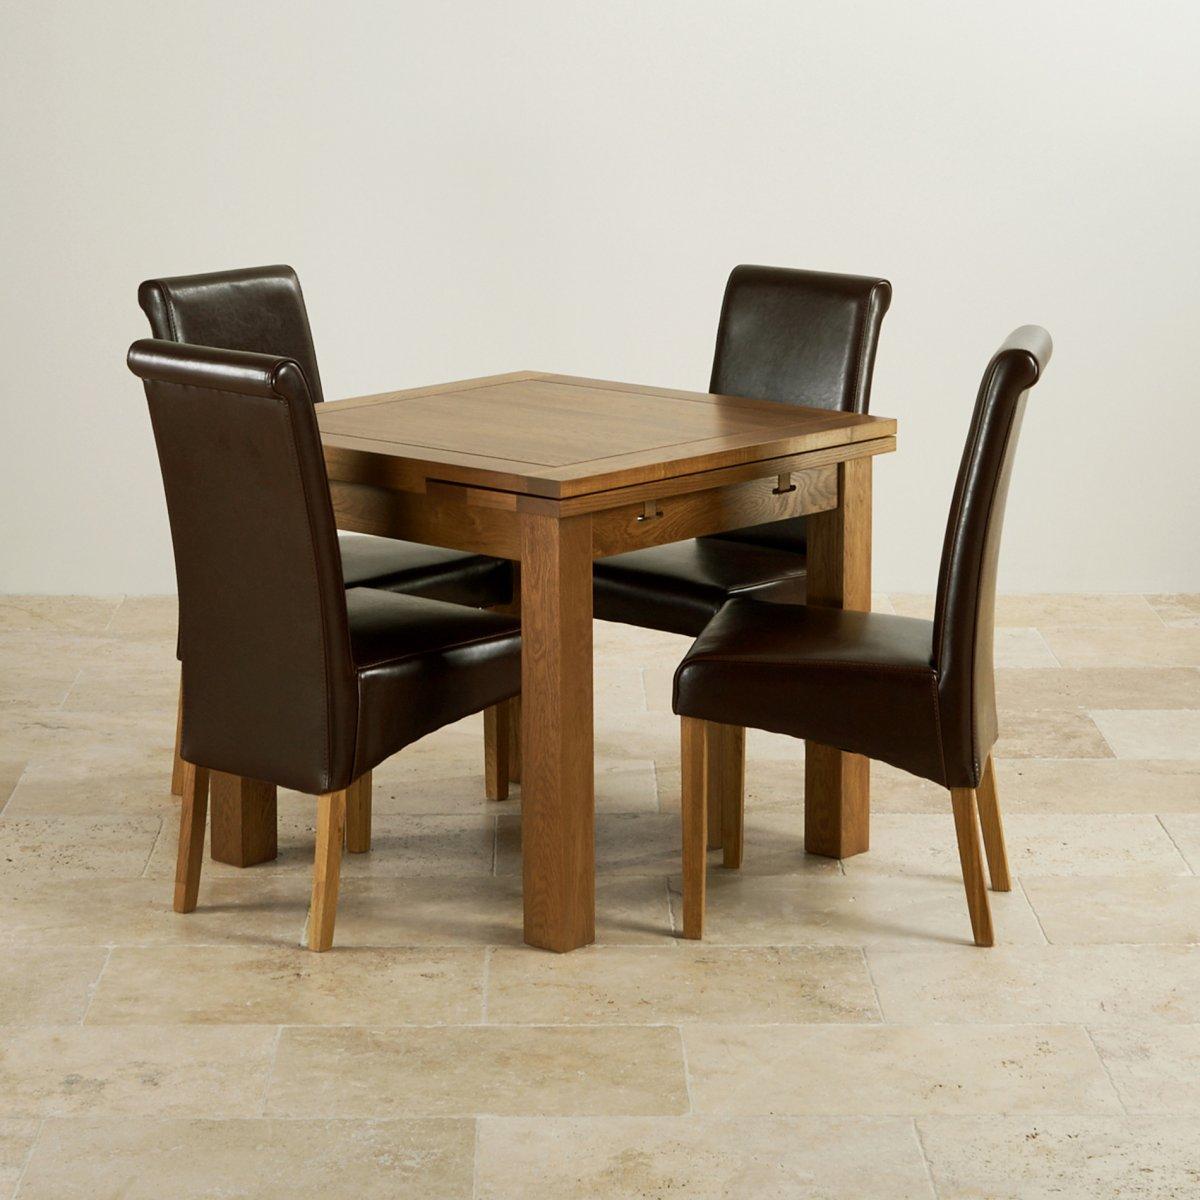 rustic leather dining room chairs. bradley s furniture etc utah